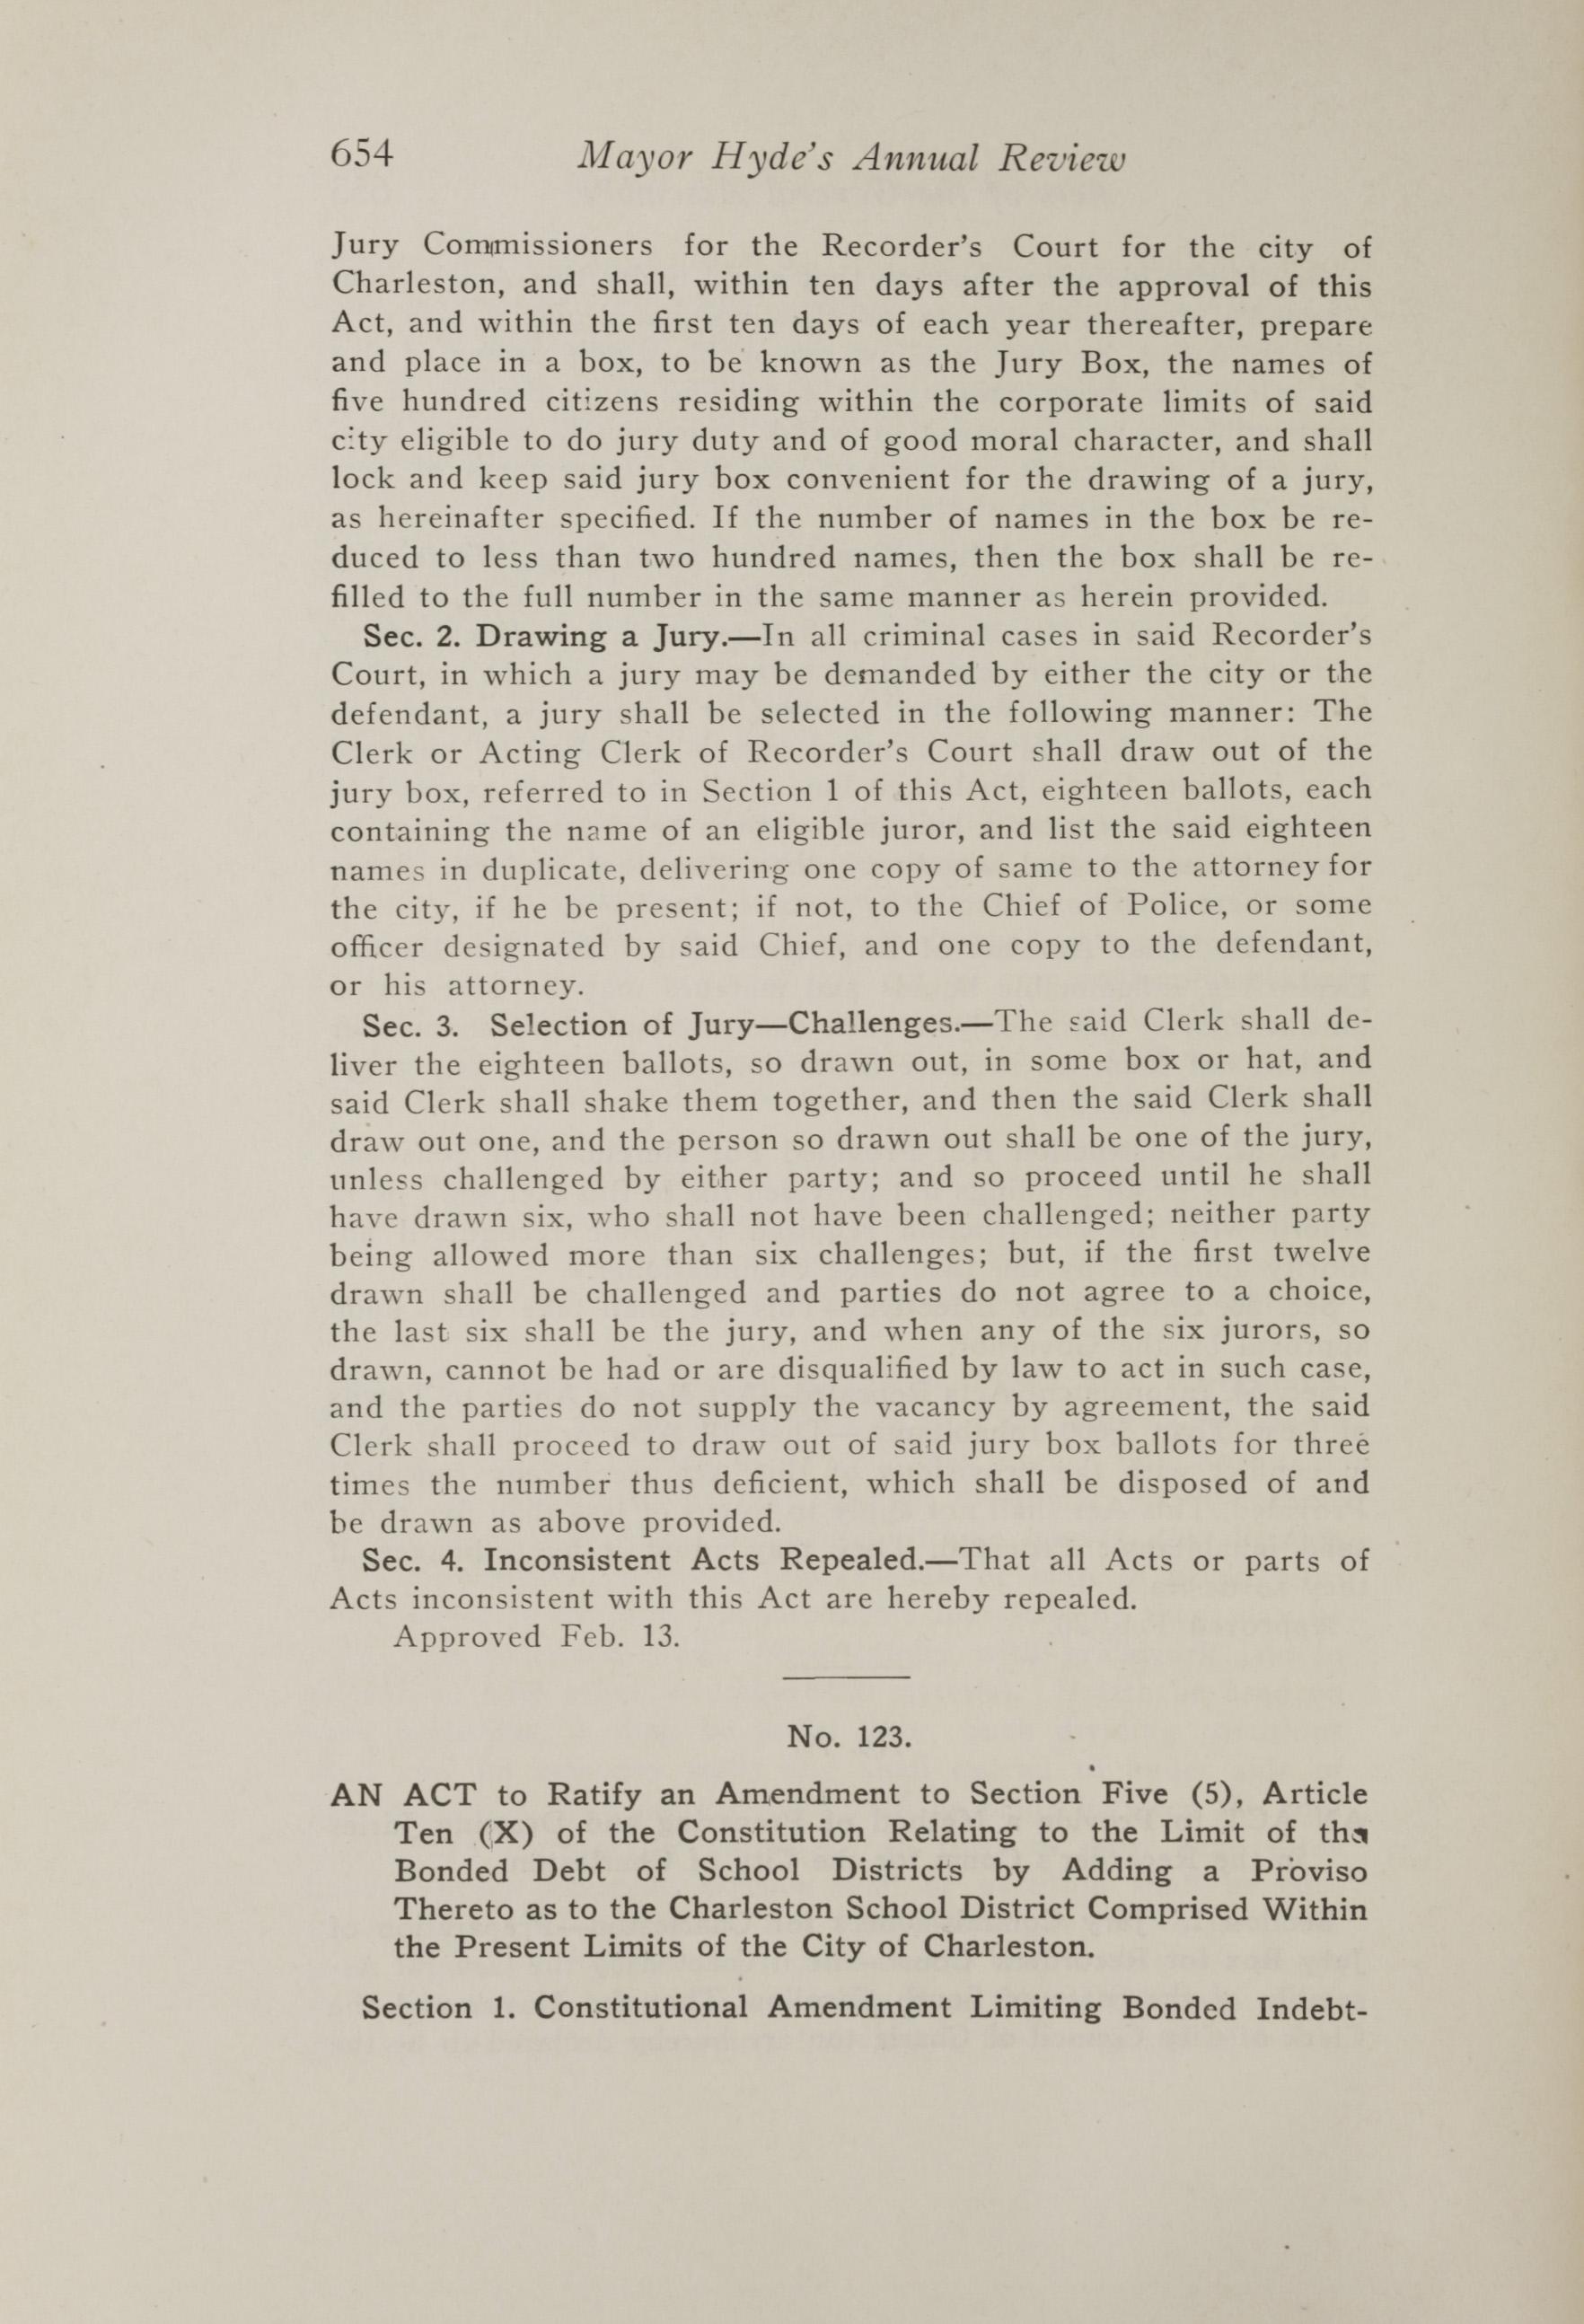 Charleston Yearbook, 1917, page 654